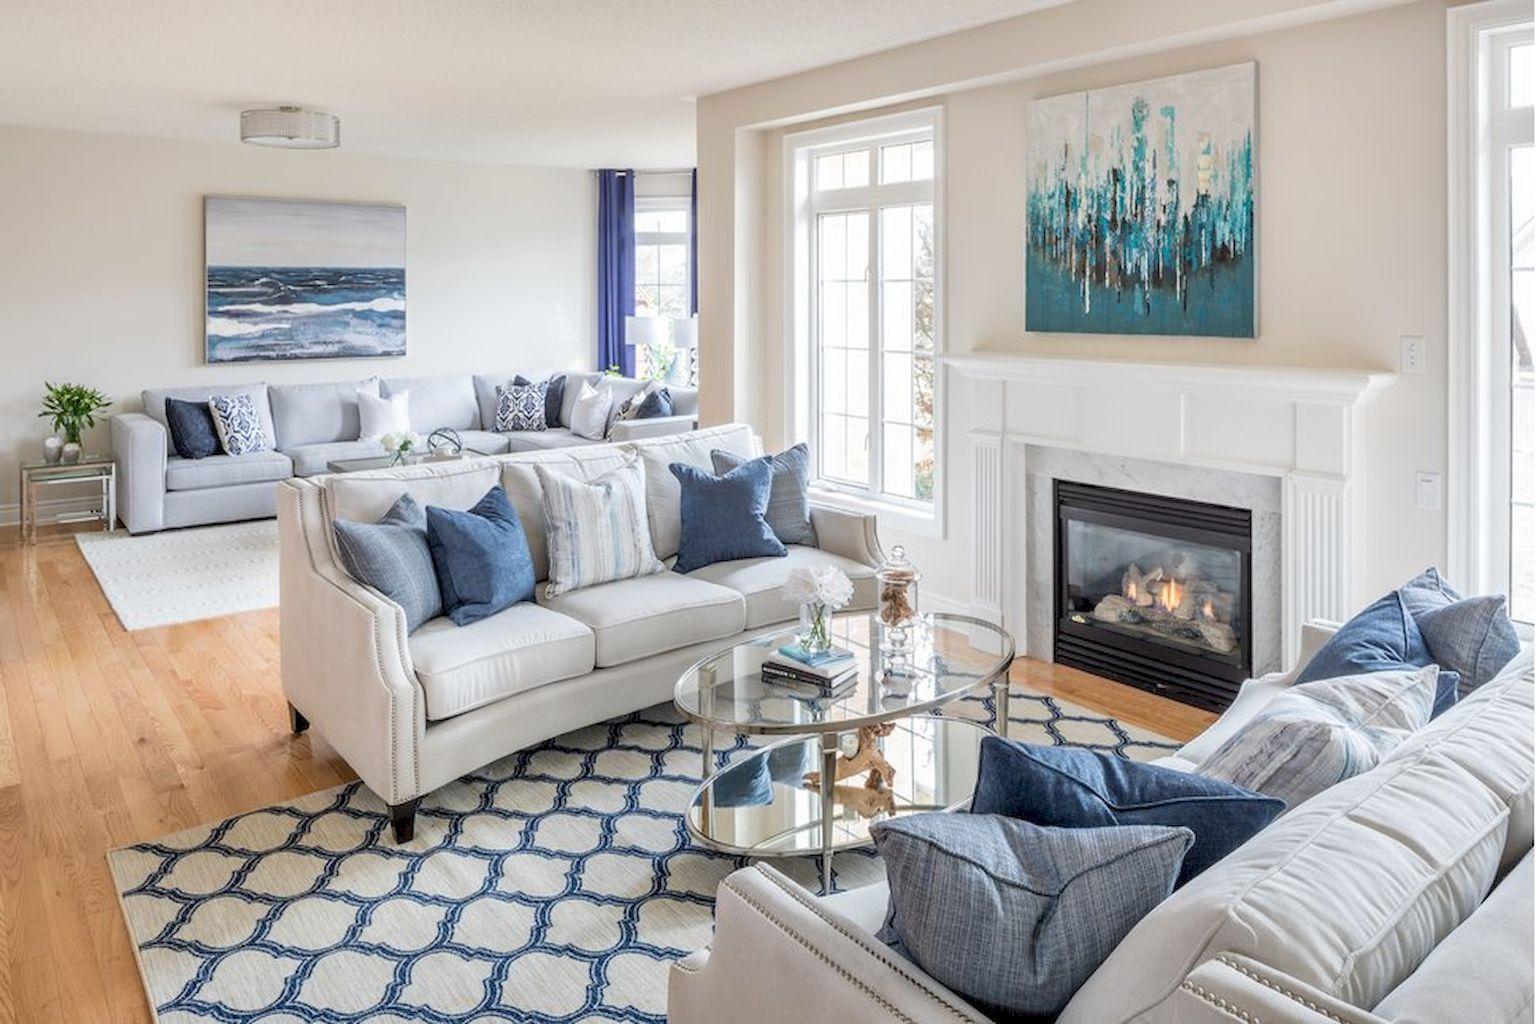 99 Cozy and Stylish Coastal Living Room Decor Ideas | Coastal living ...